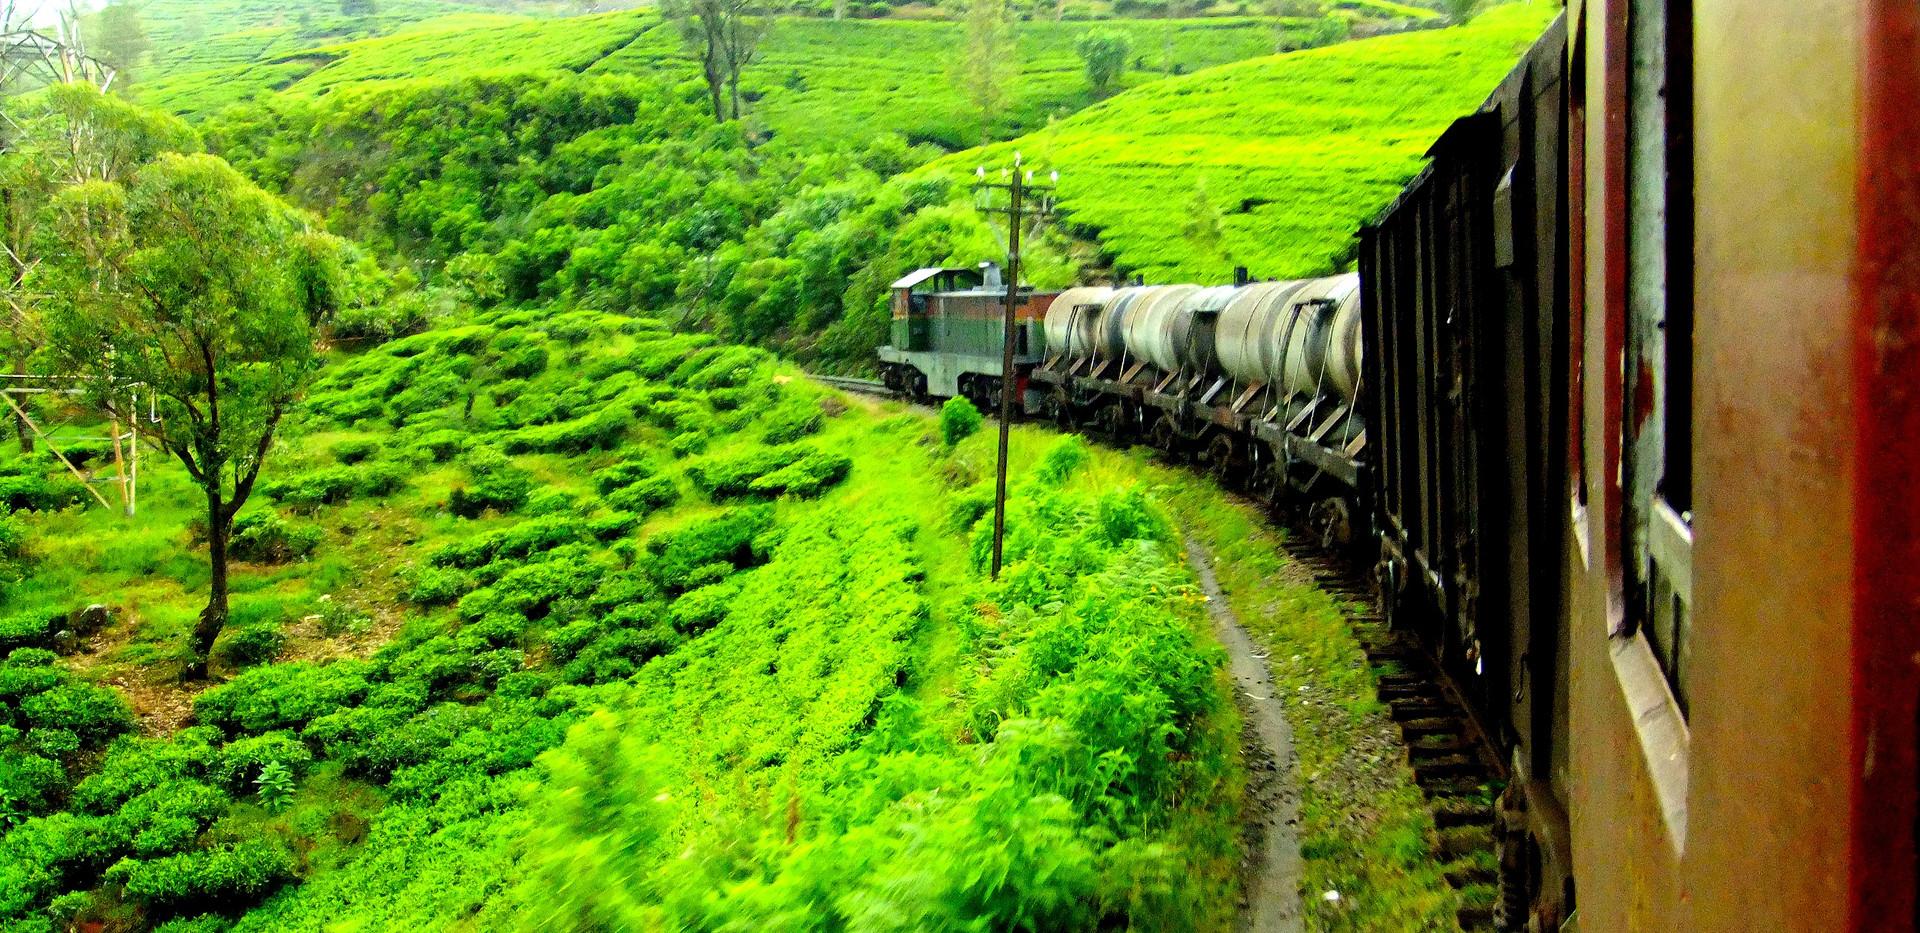 Nuwaraeliya%20Train%20Journey_edited.jpg